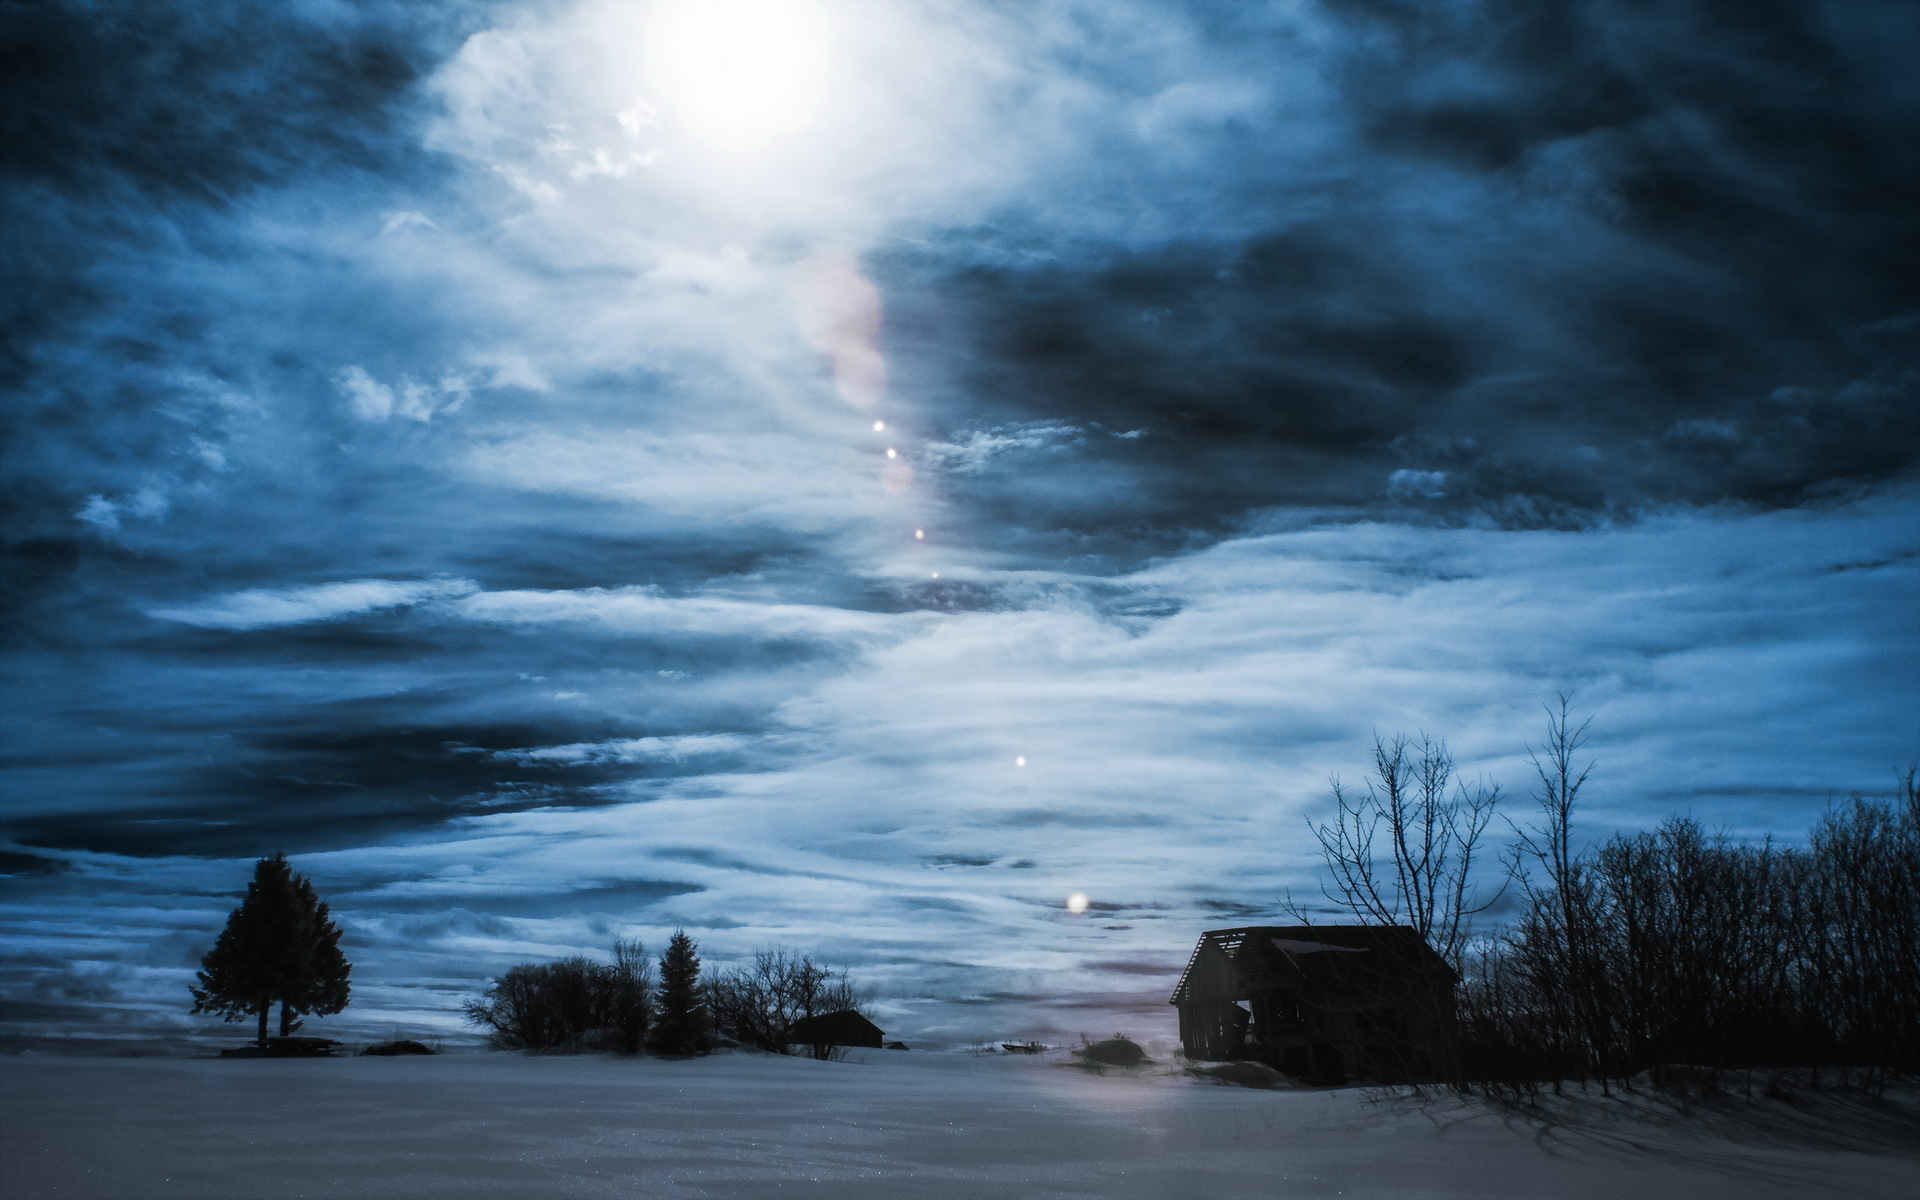 Night Winter House Landscape Clouds Sky Wallpaper